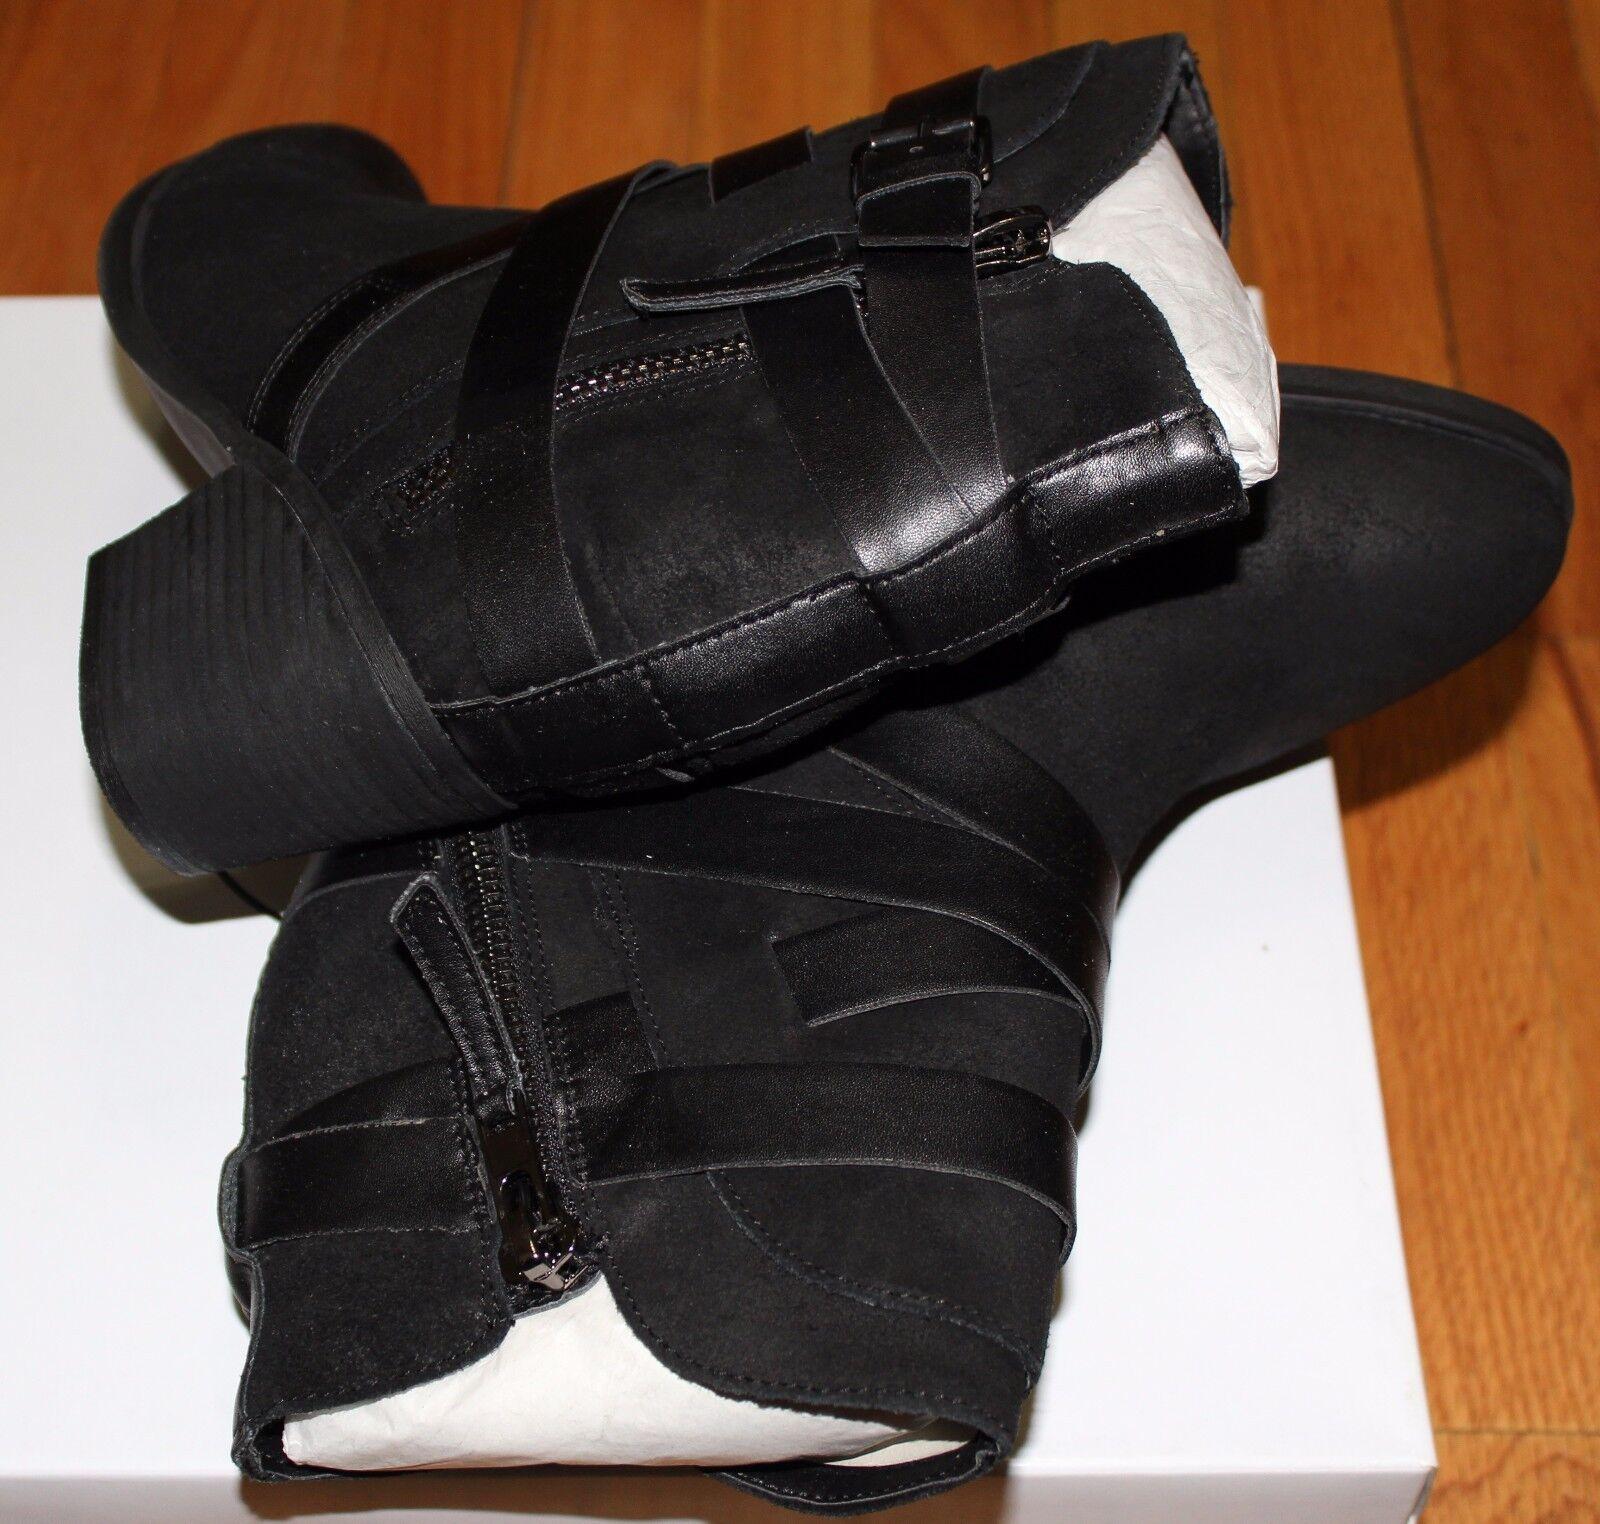 148 10M STEVE MADDEN PAIVA BLACK LEATHER ANKLE Stiefel SZ 10M 148 US 1c1707